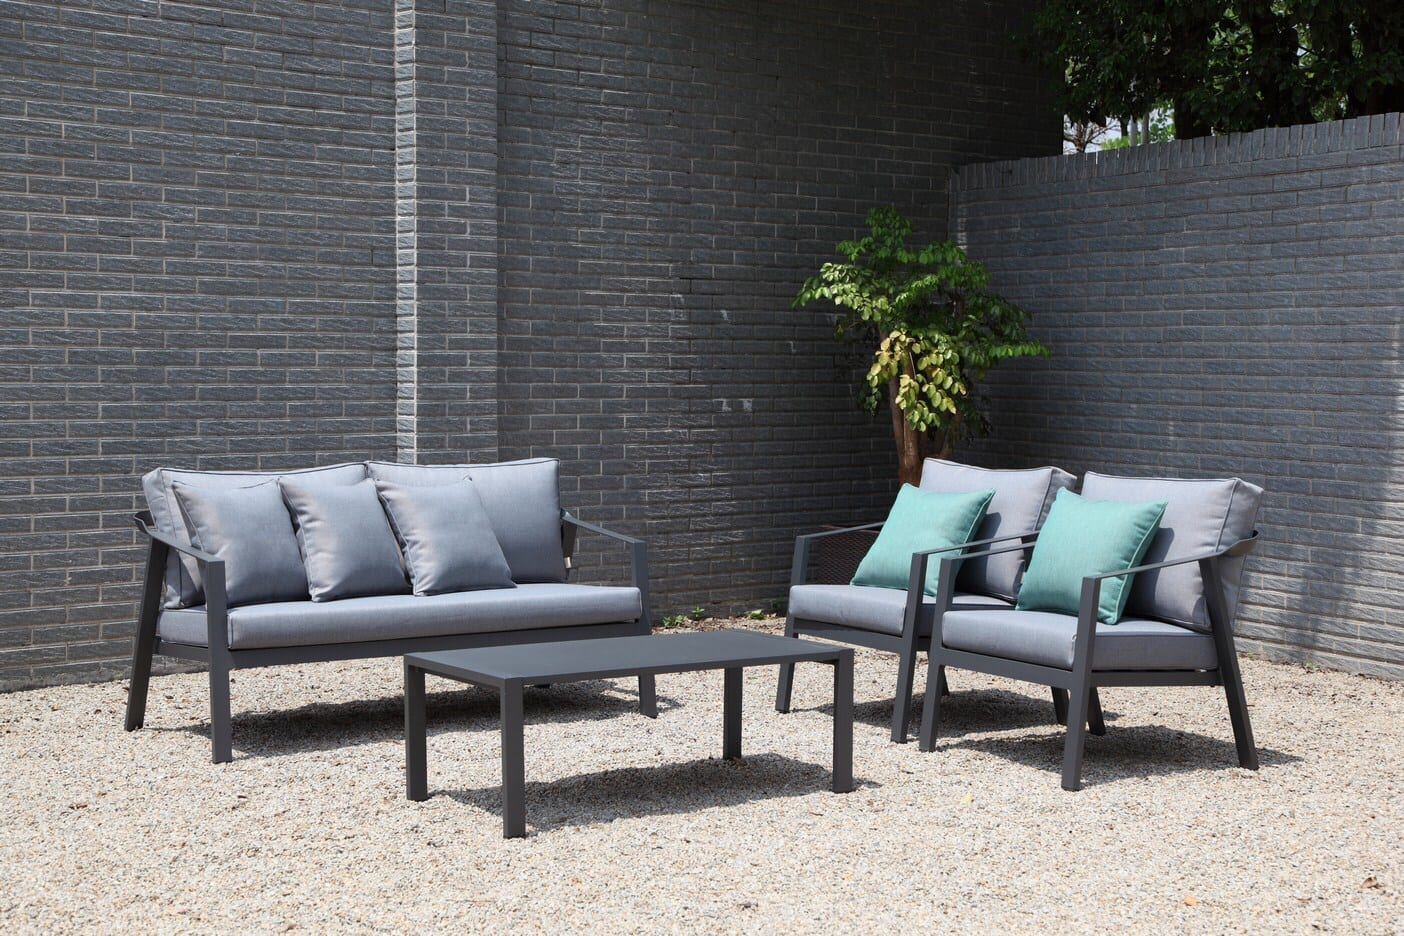 400850-Fine-Design-utesofa-hagemøbler